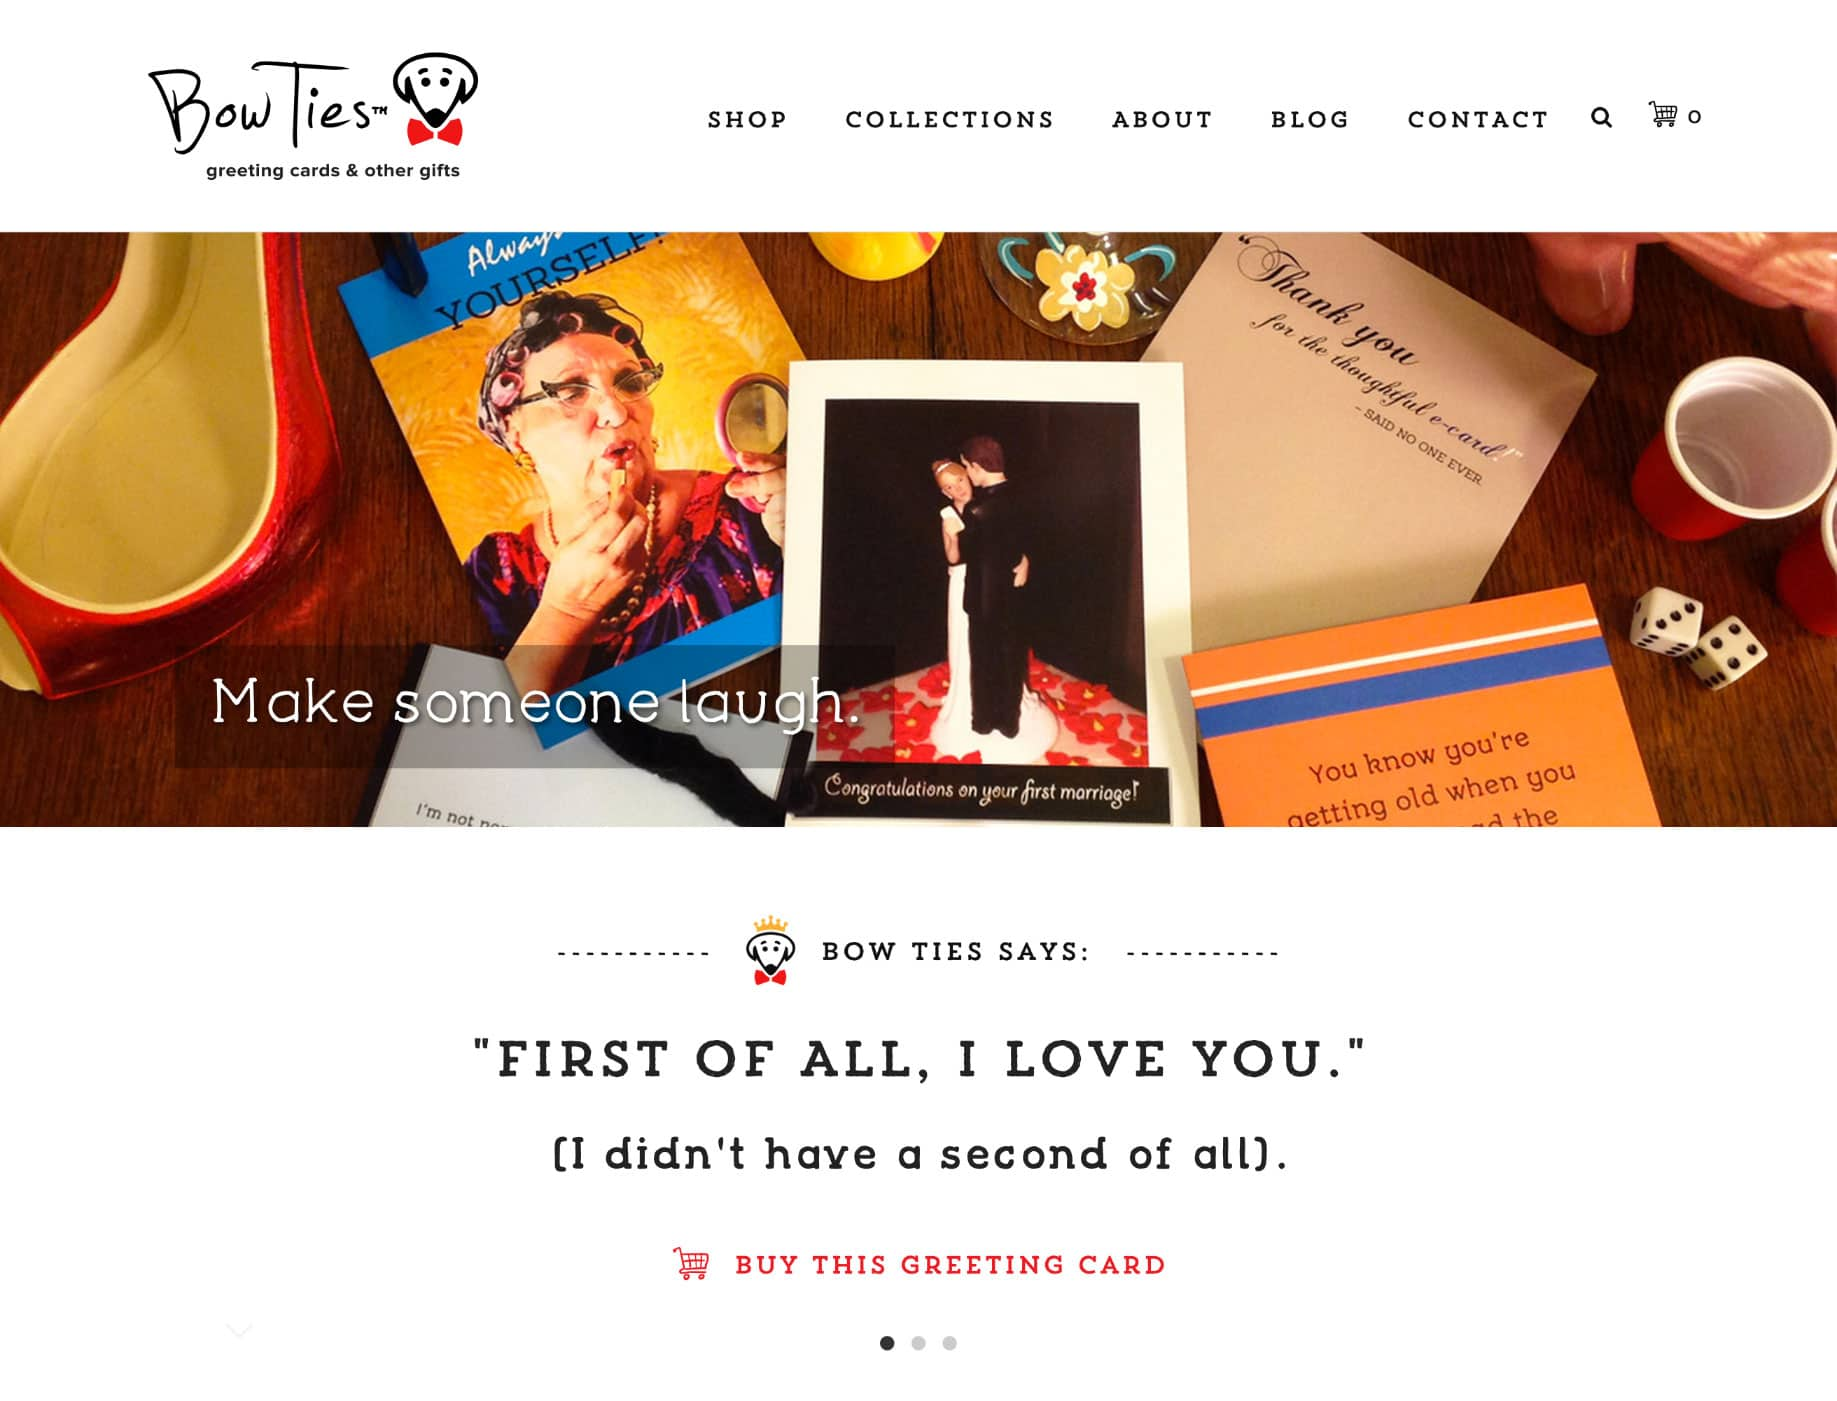 screen responsive web design and shop e-commerce site